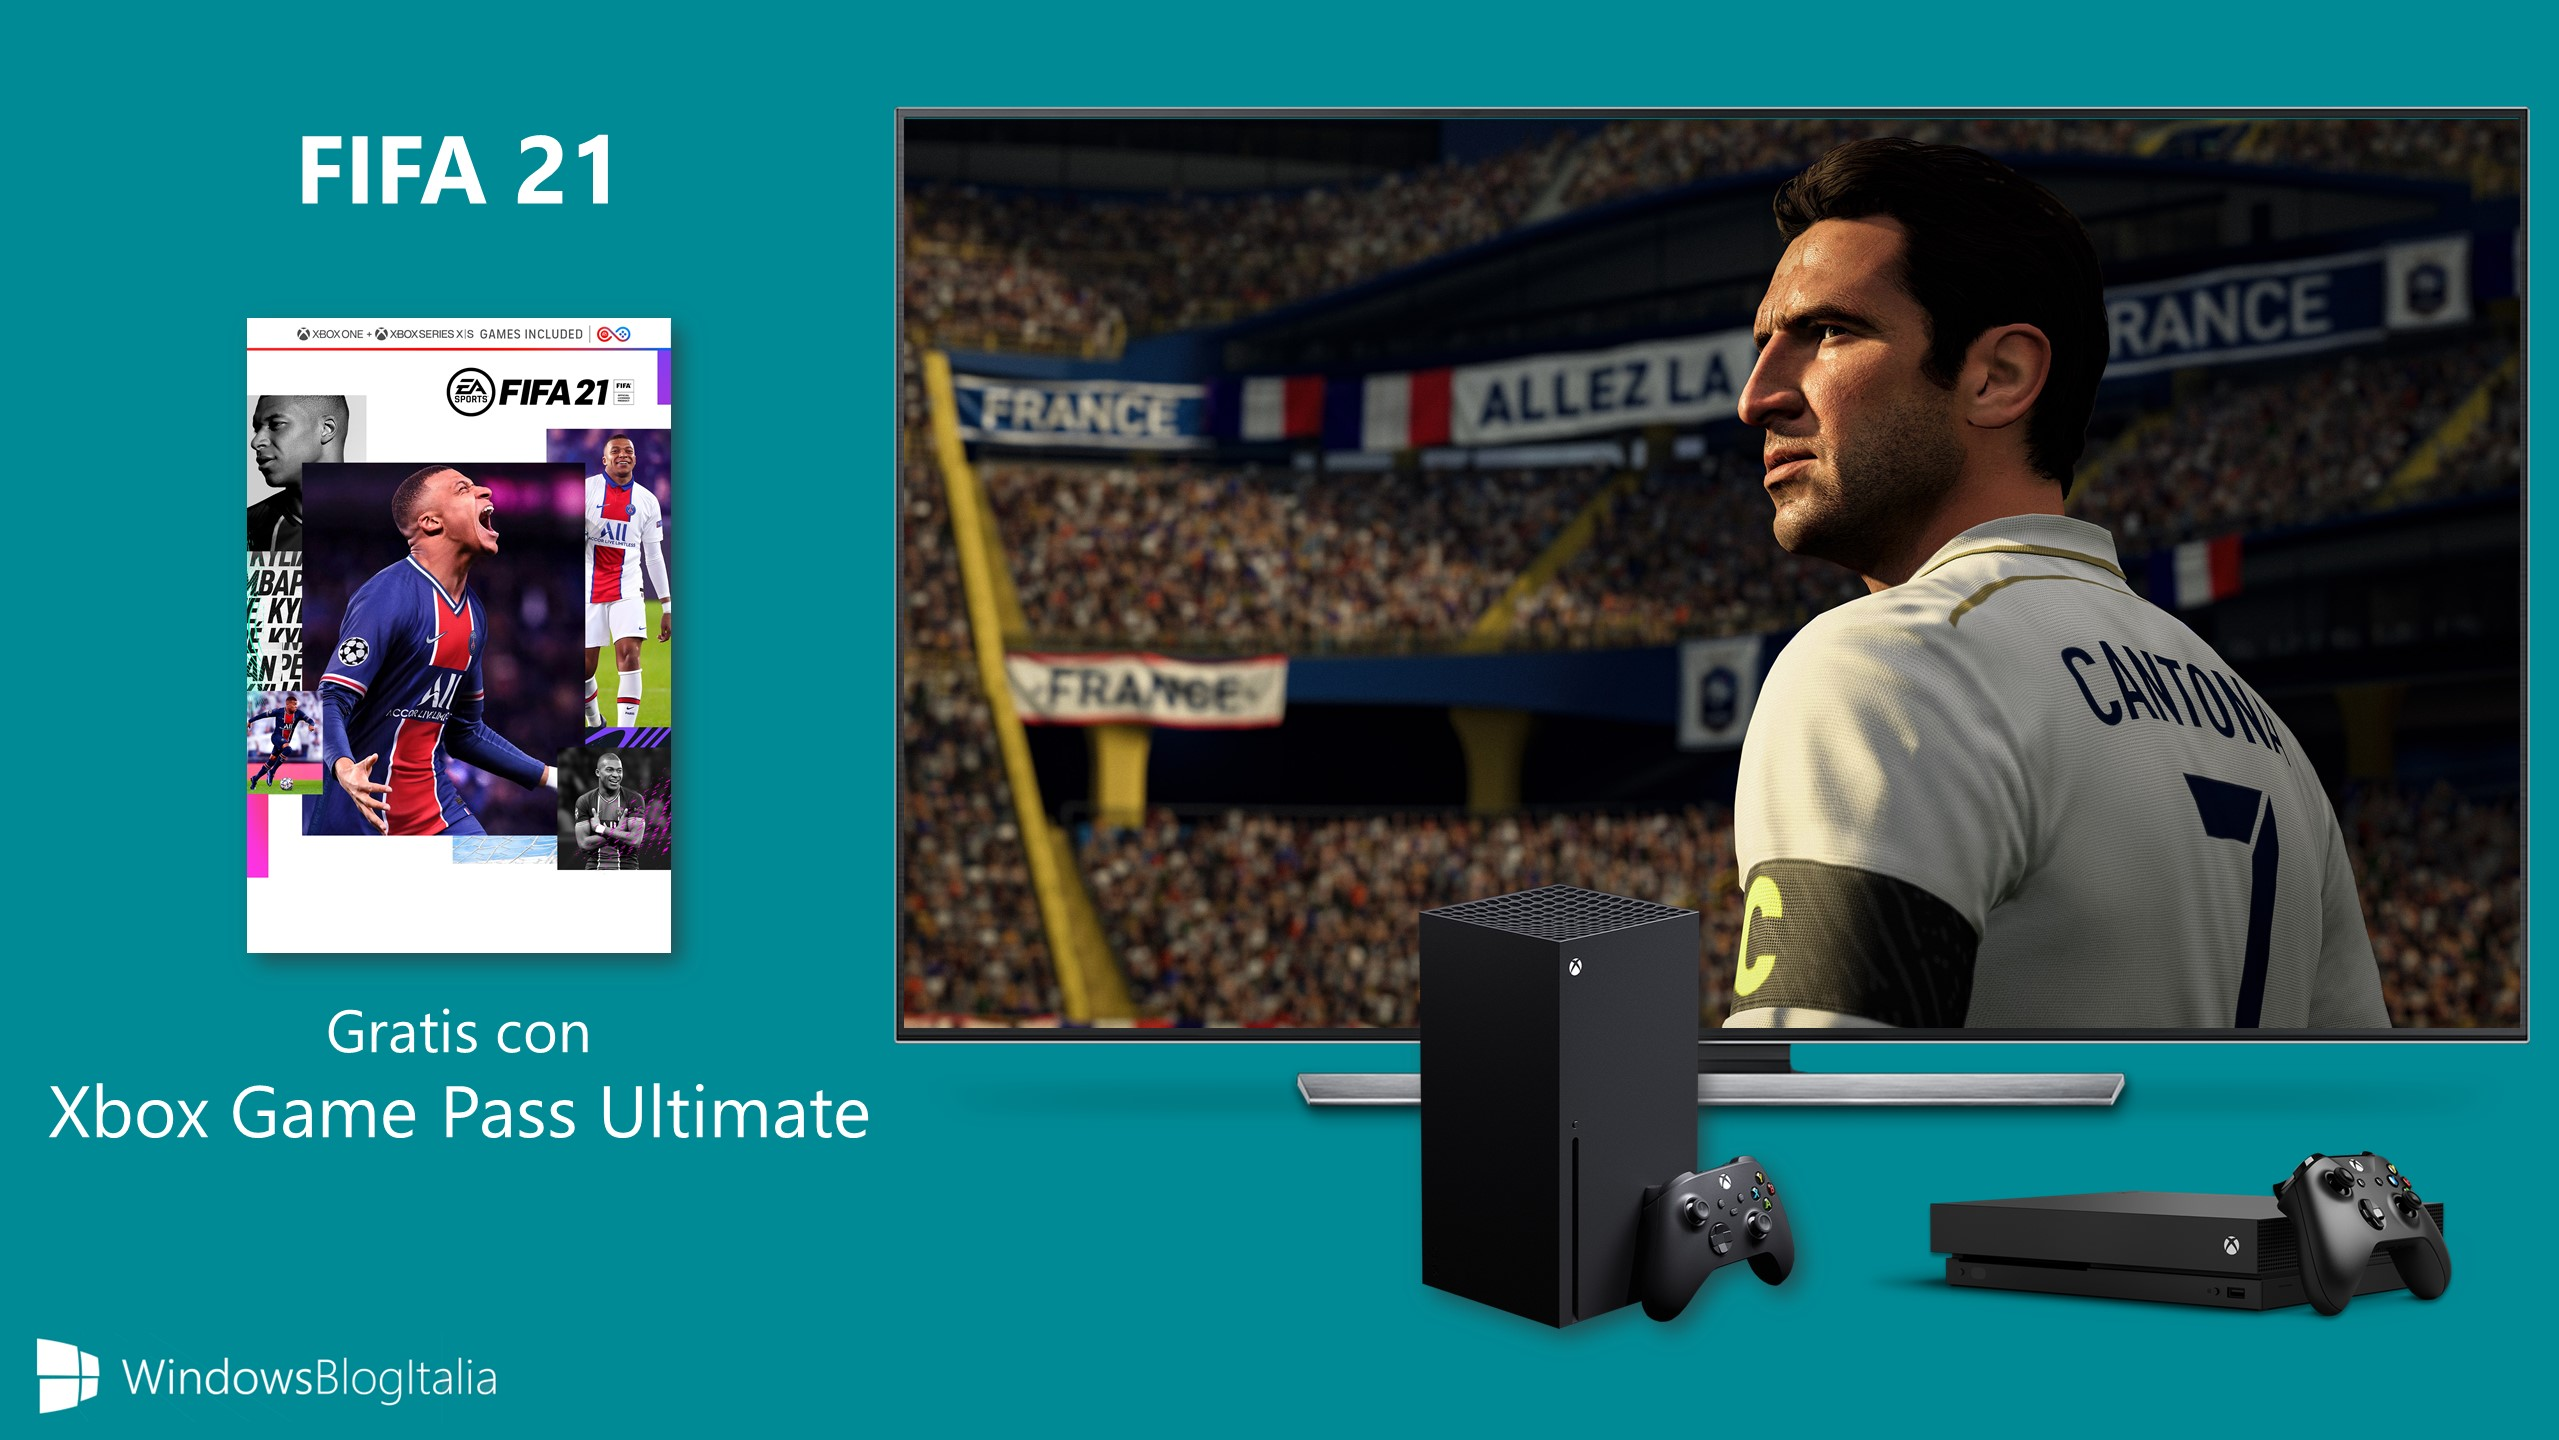 FIFA 21 gratis - Xbox Game Pass Ultimate